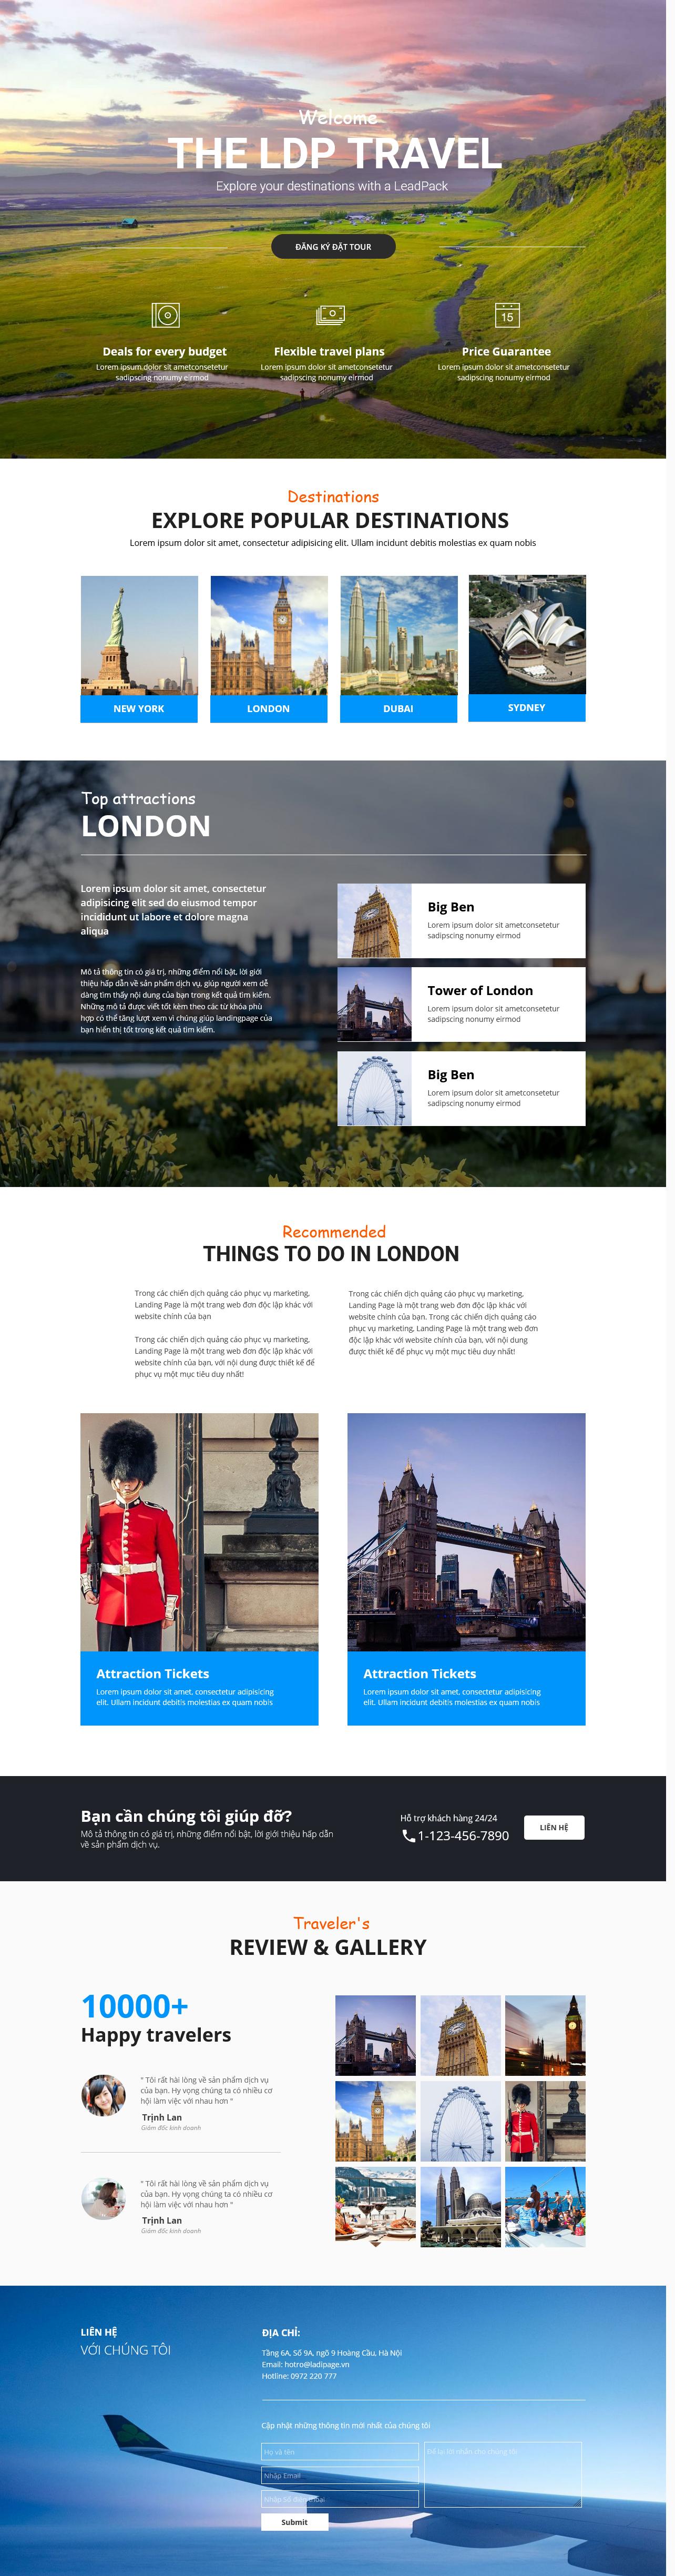 Thiết kế website Thiết kế webiste landingpage du-lich---khach-san---nghi-duong Du lịch 15